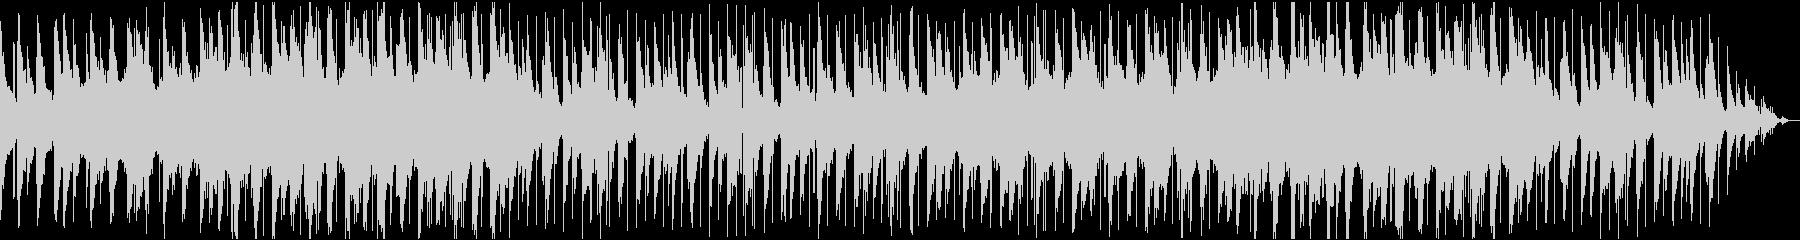 Lo-Fi エレキギター ピアノの未再生の波形